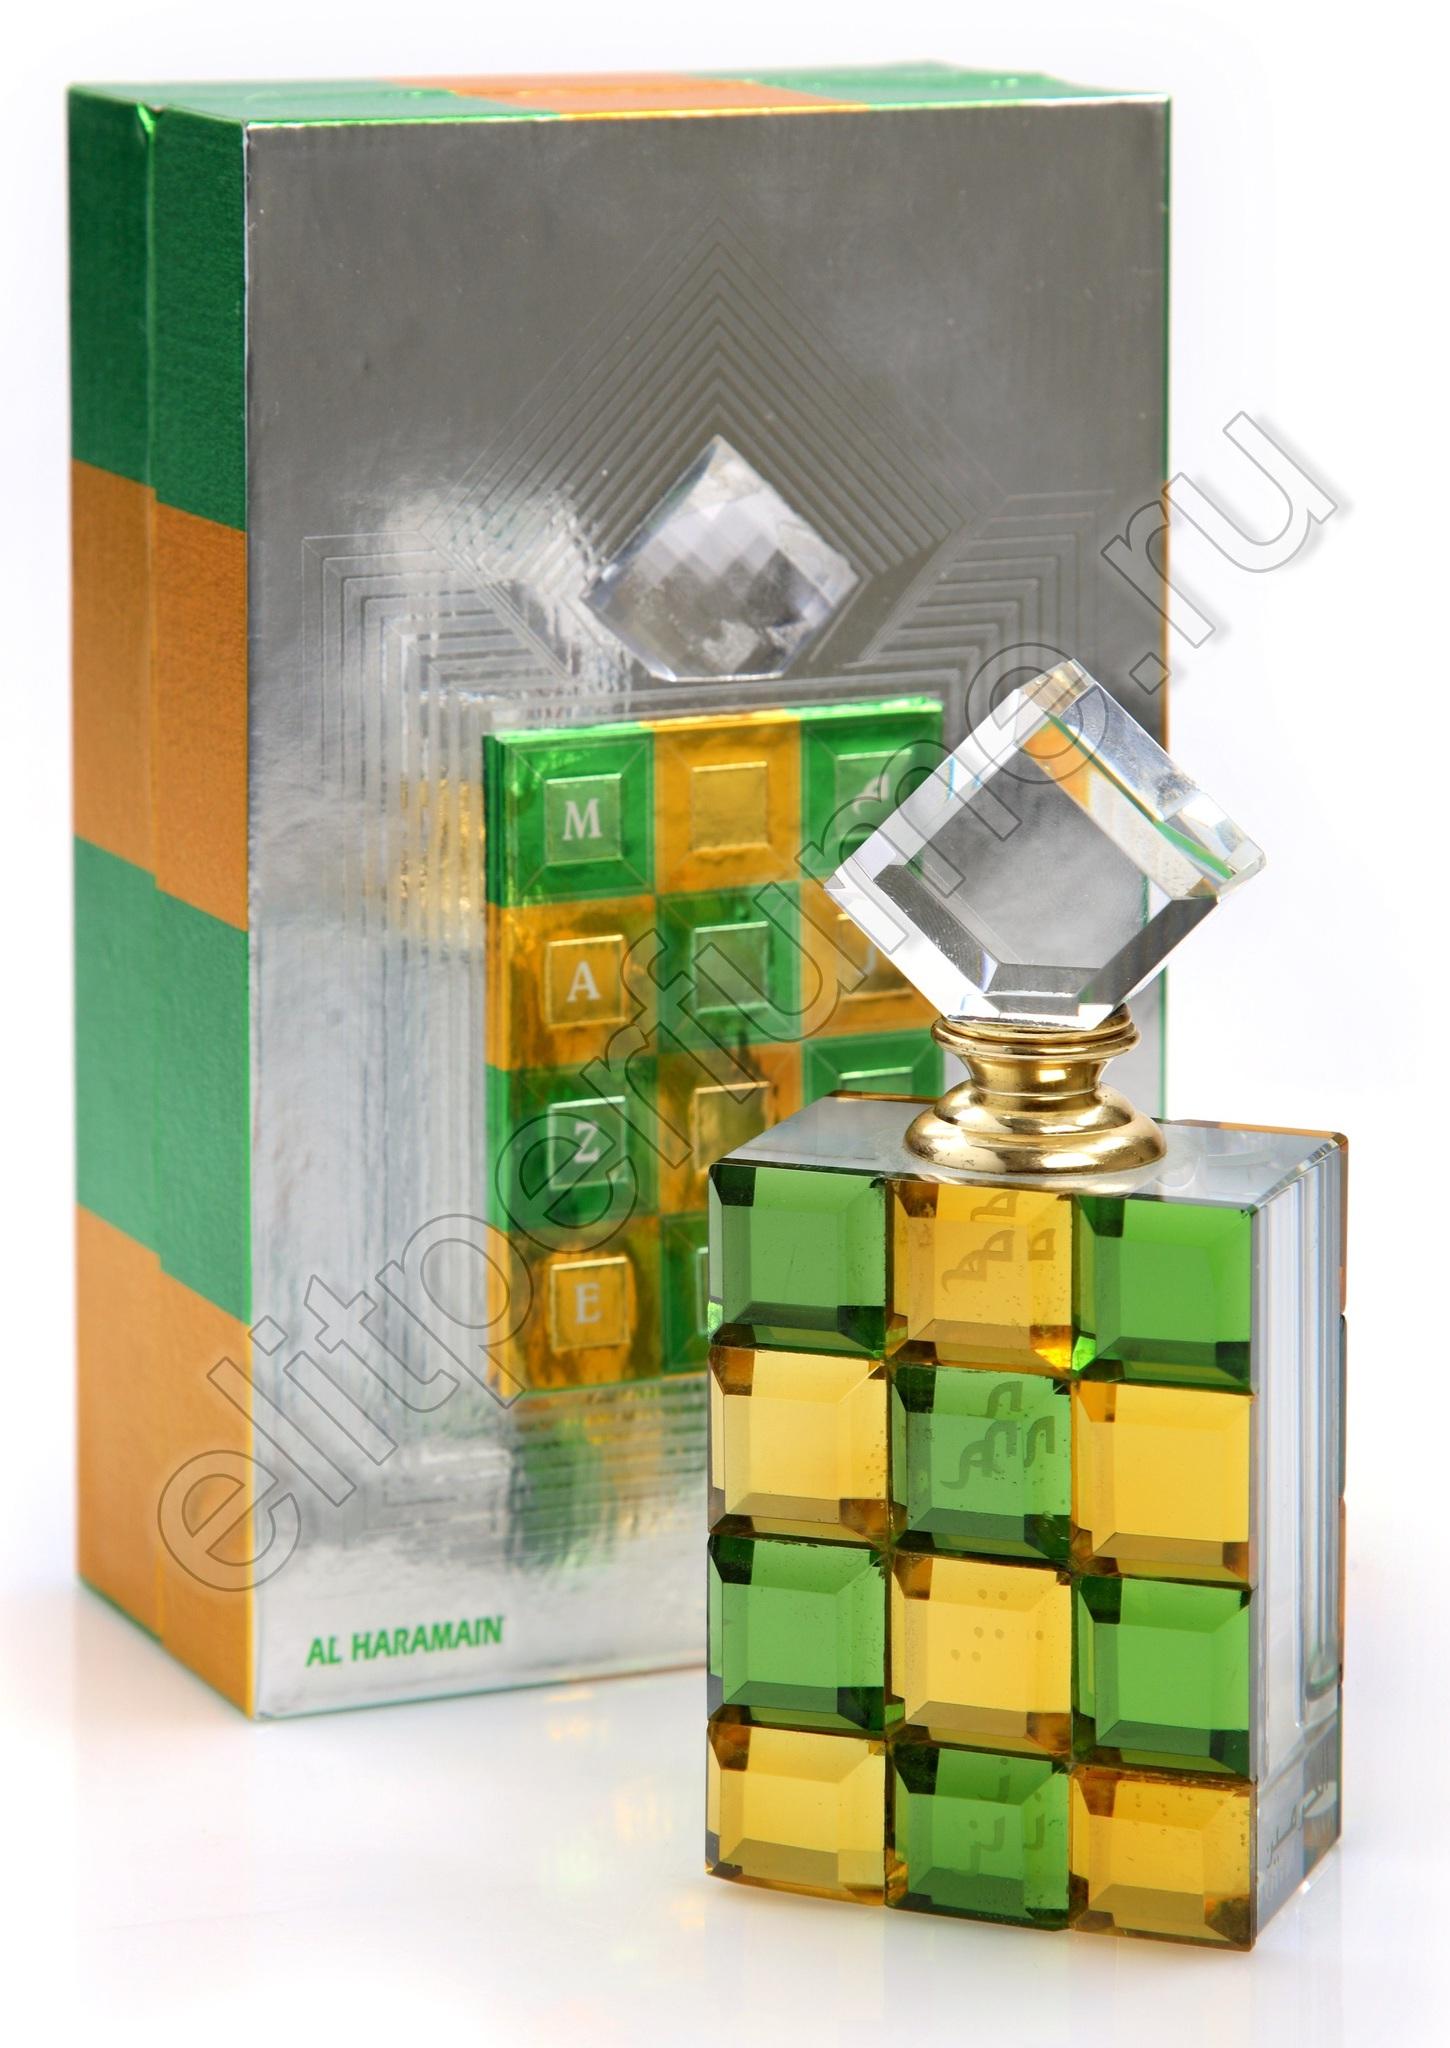 Лабиринт / Maze 12 мл арабские масляные духи от Аль Харамайн Al Haramain Perfumes